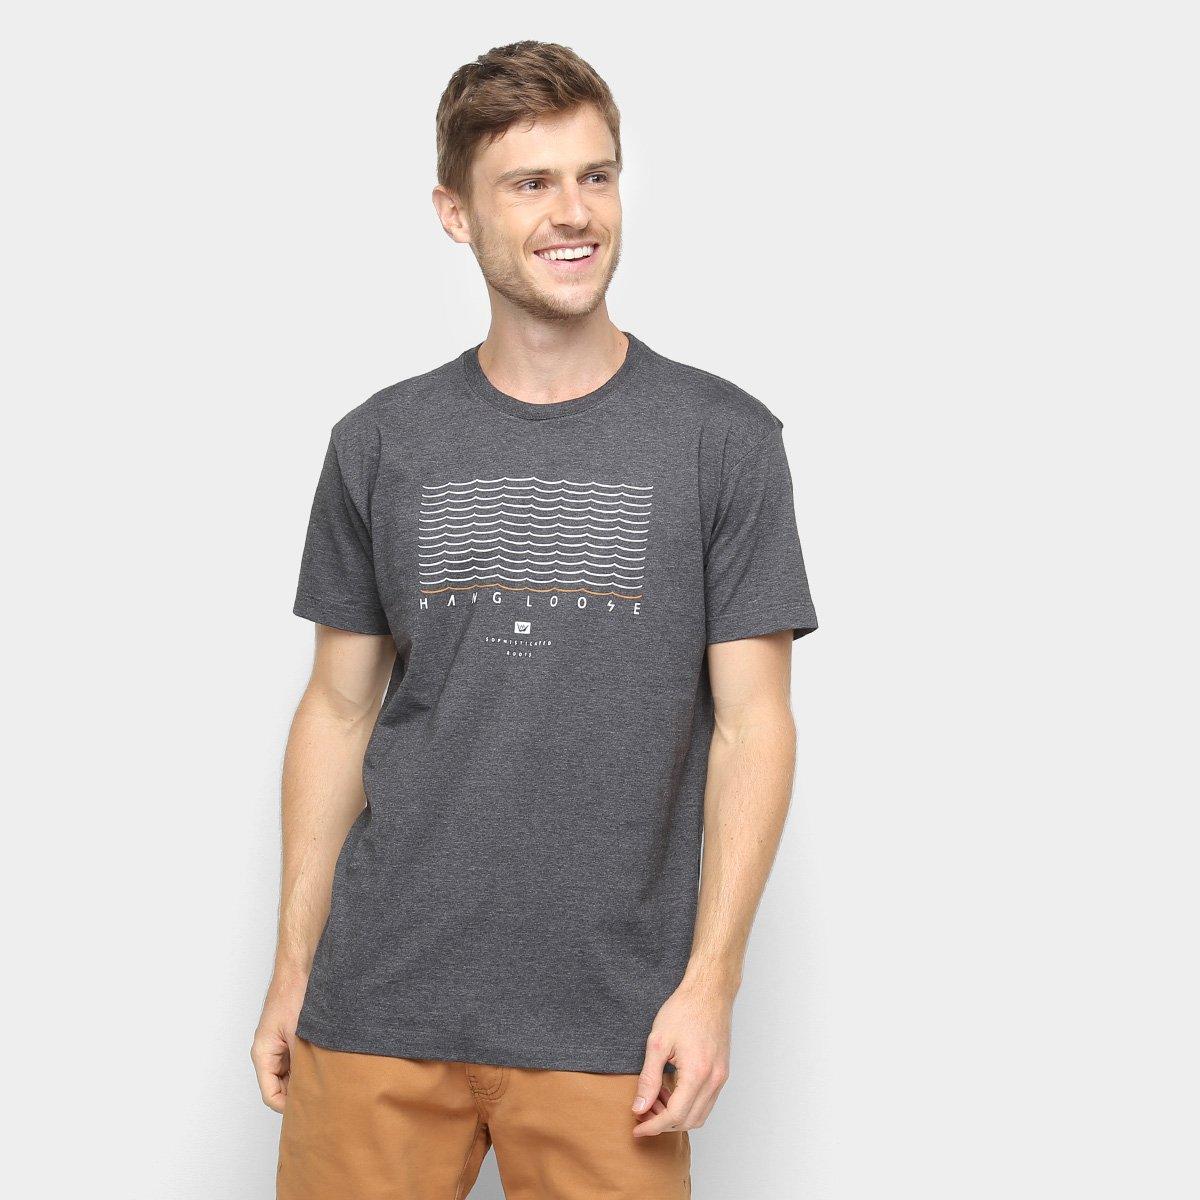 48b80a930e Camiseta Hang Loose Silk Wavy Masculina